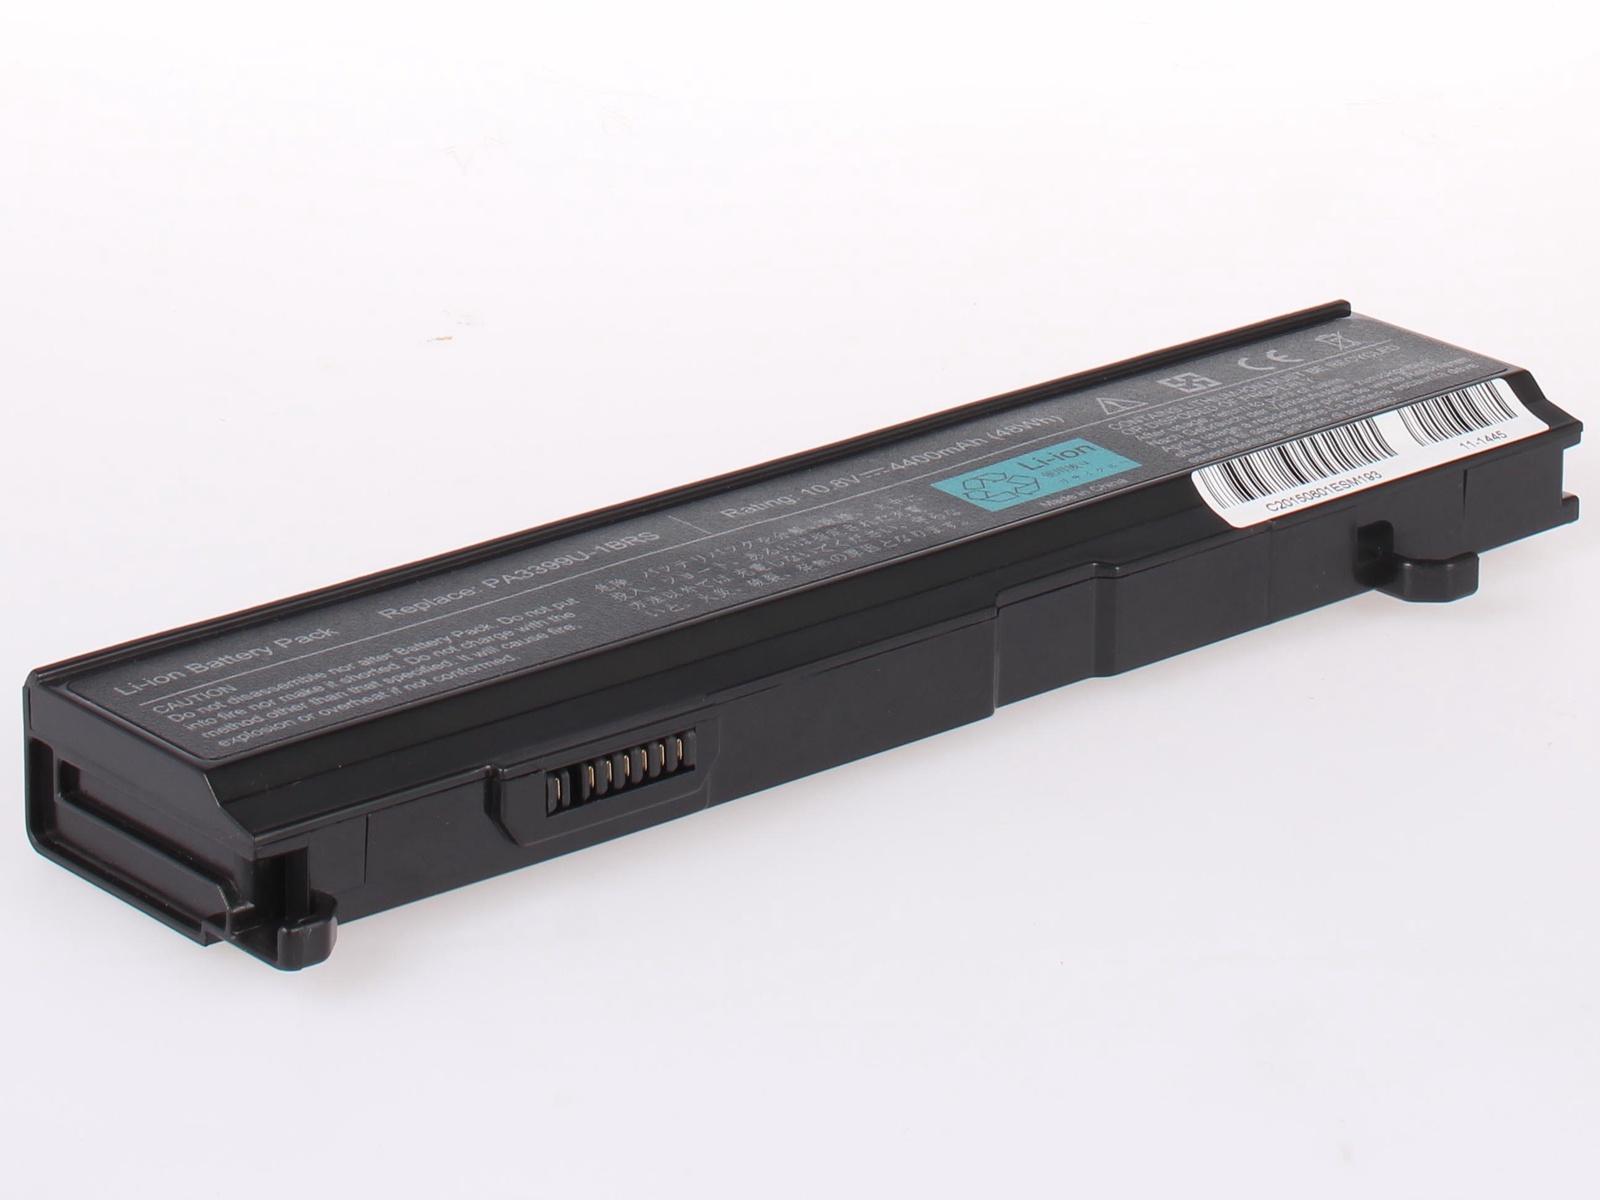 Аккумулятор для ноутбука AnyBatt для ToshiBa Satellite A100-049, Satellite A105-S4284, Satellite A105-S4384, Satellite M45-S355, Satellite M50, Satellite M55-S331, Equium M50, Satellite A100-012, Satellite A100-294 цена